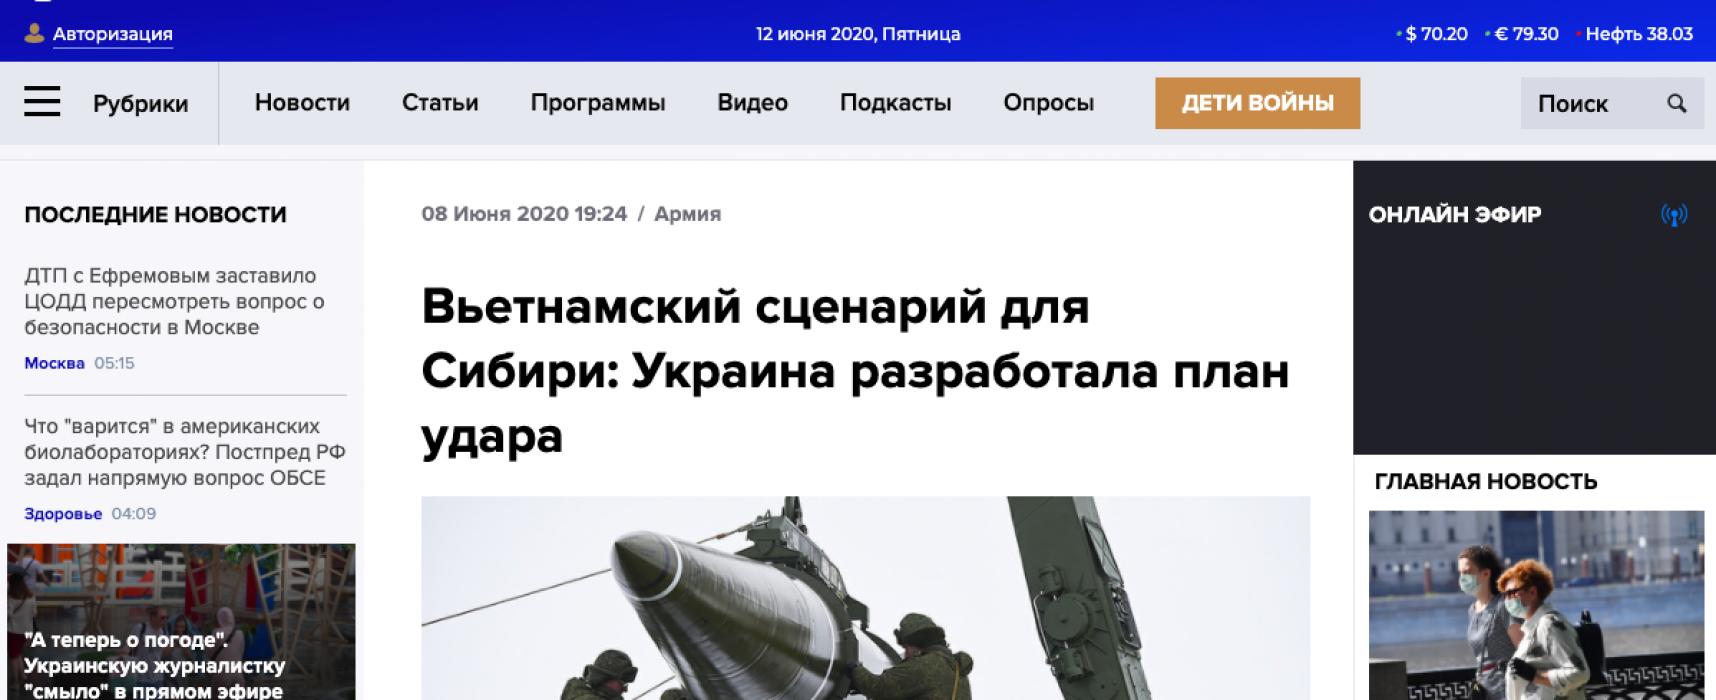 Fake: US to Bomb Siberia According to Ukrainian Plan